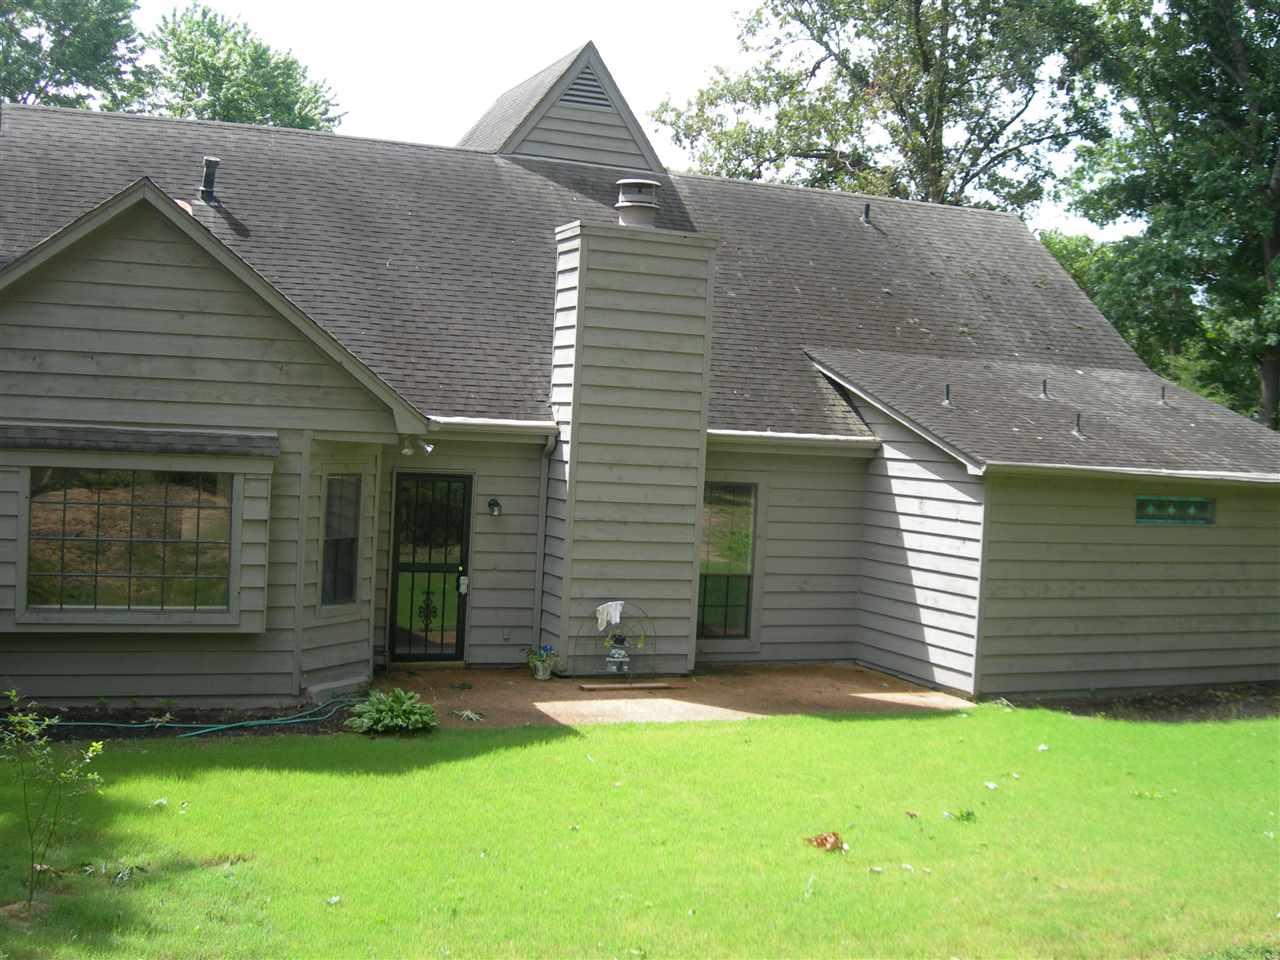 2219 Nutbush Memphis, TN 38016 - MLS #: 10005008